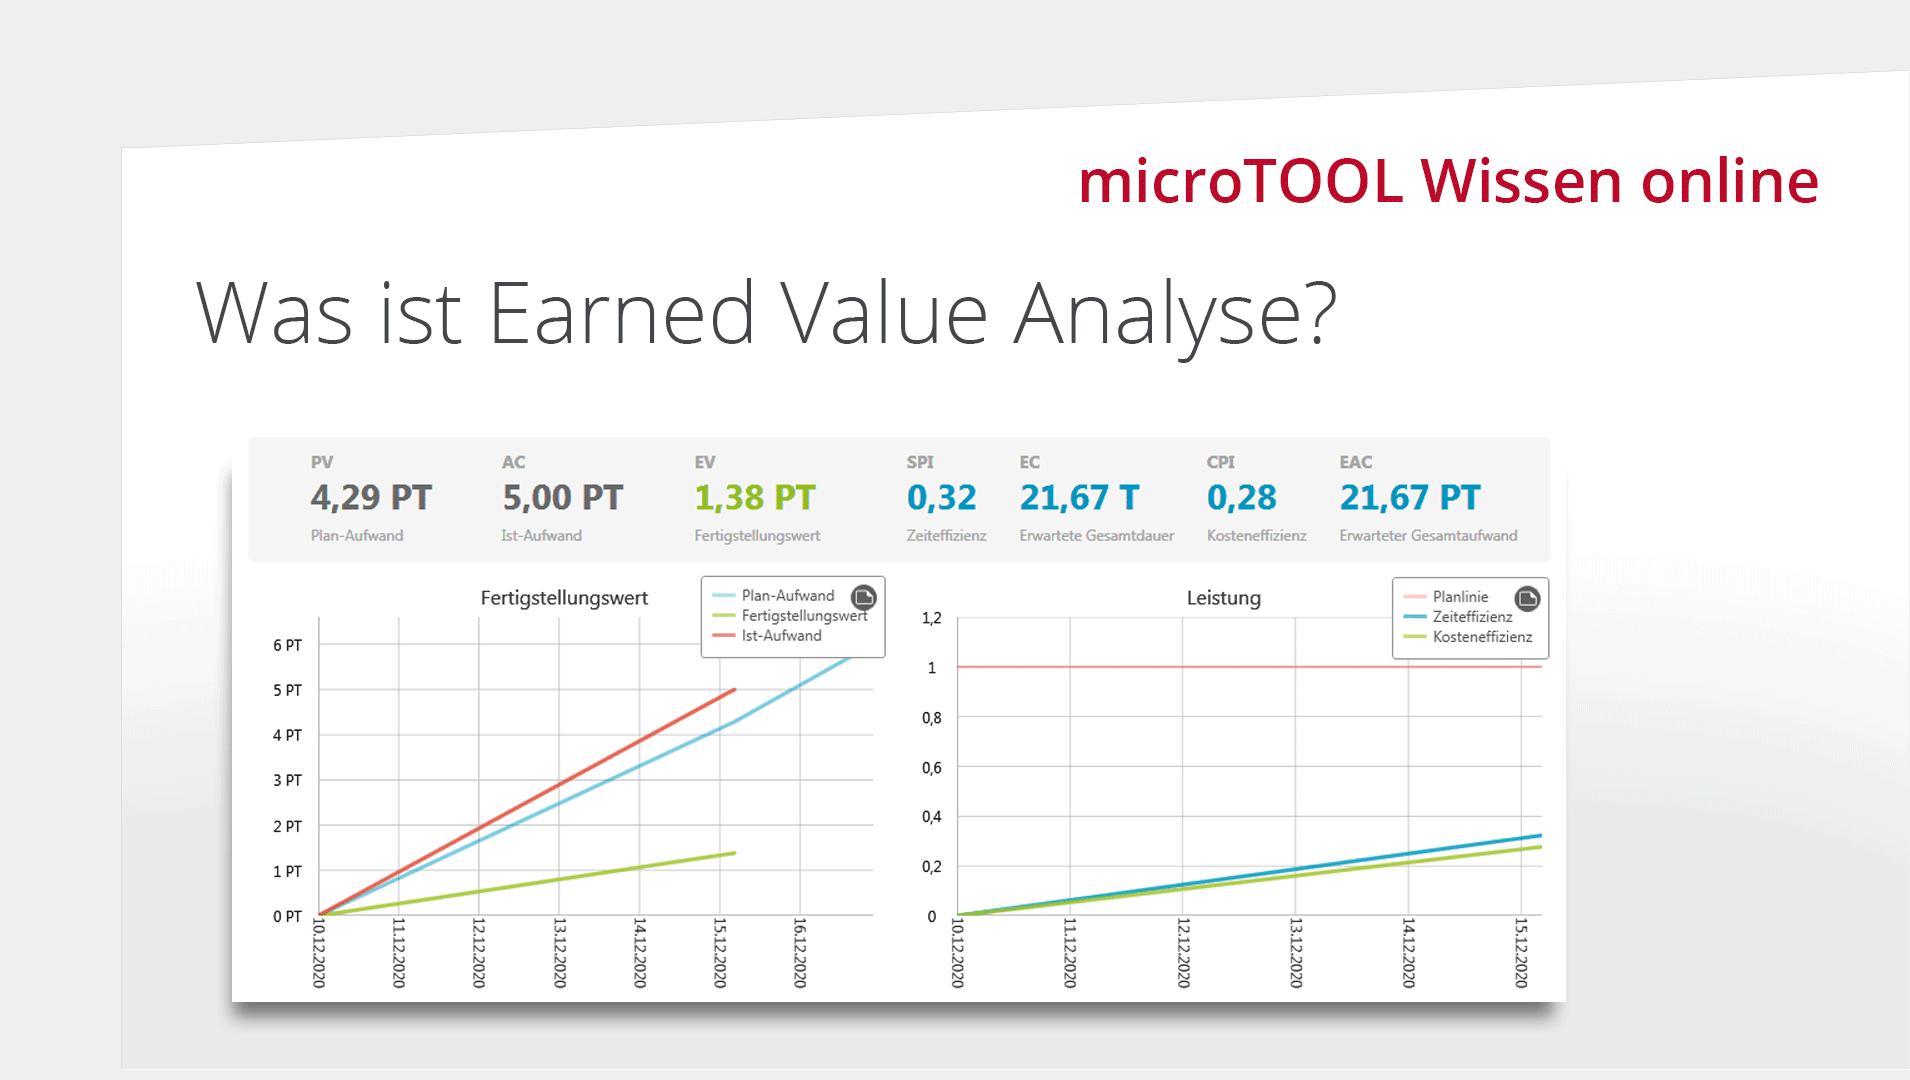 Wissen Online: Was ist die Earned Value Analyse?